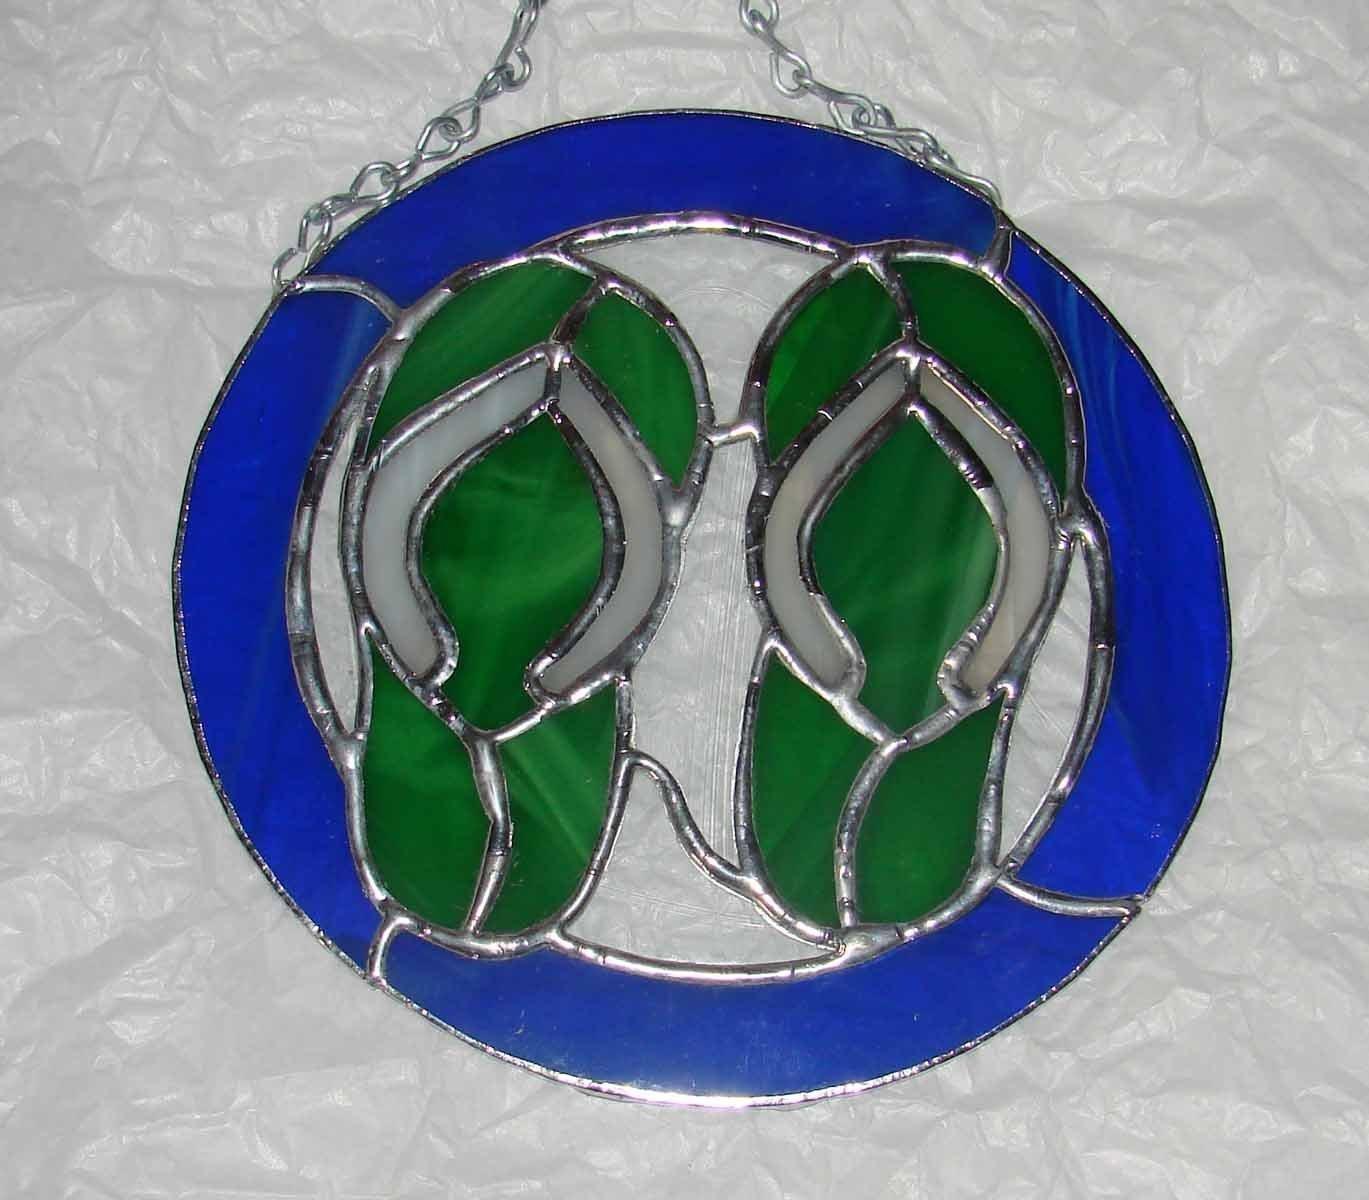 814db23f2f65 Amazon.com  Flip Flops - Blue   Green Stained Glass Sun Catcher Panel   Handmade